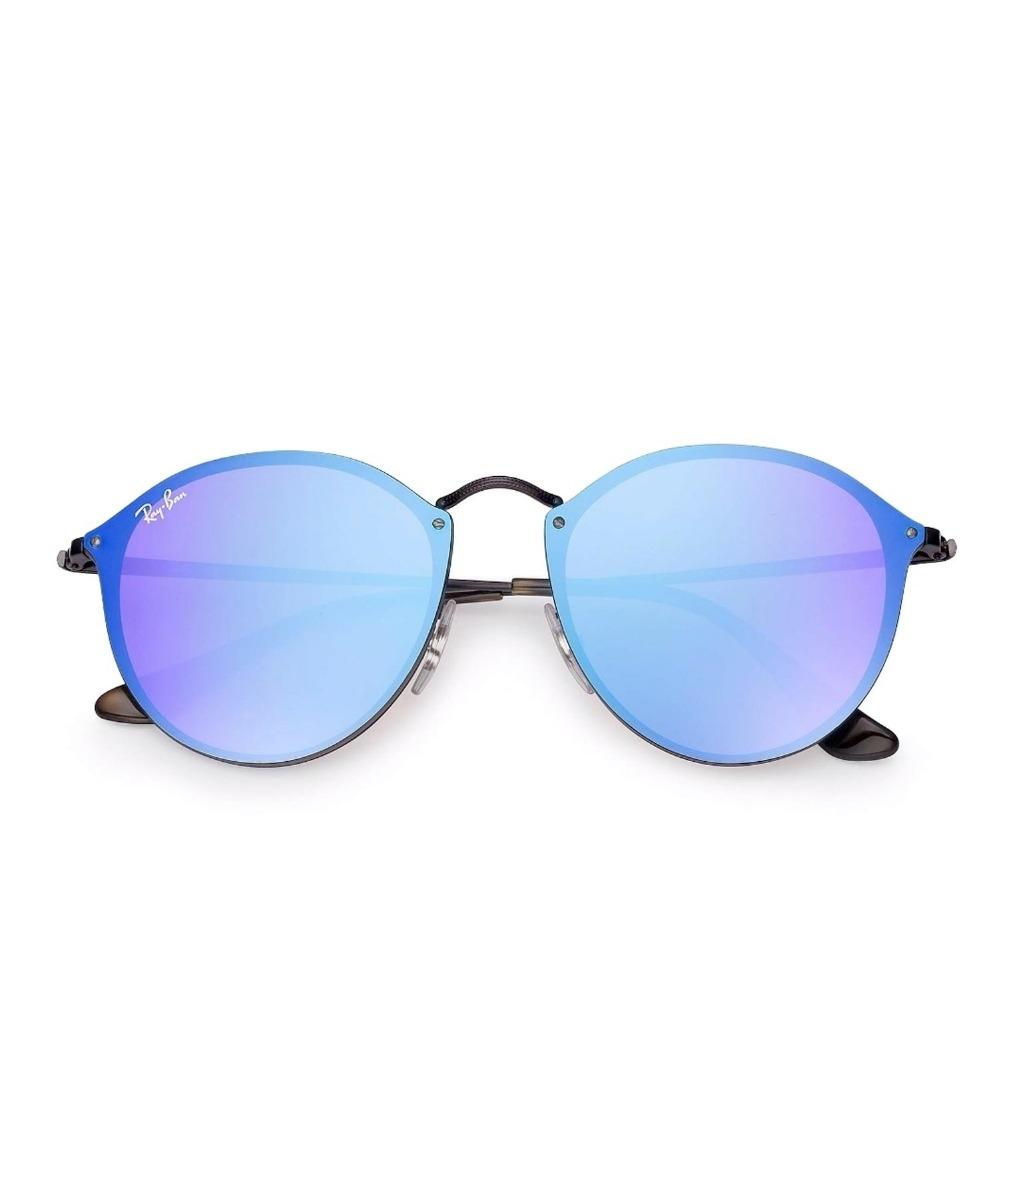 Boutique en ligne c7fb0 e87ff Gafas Ray Ban Azules Round Blaze Rb3574n 1537v Redondas